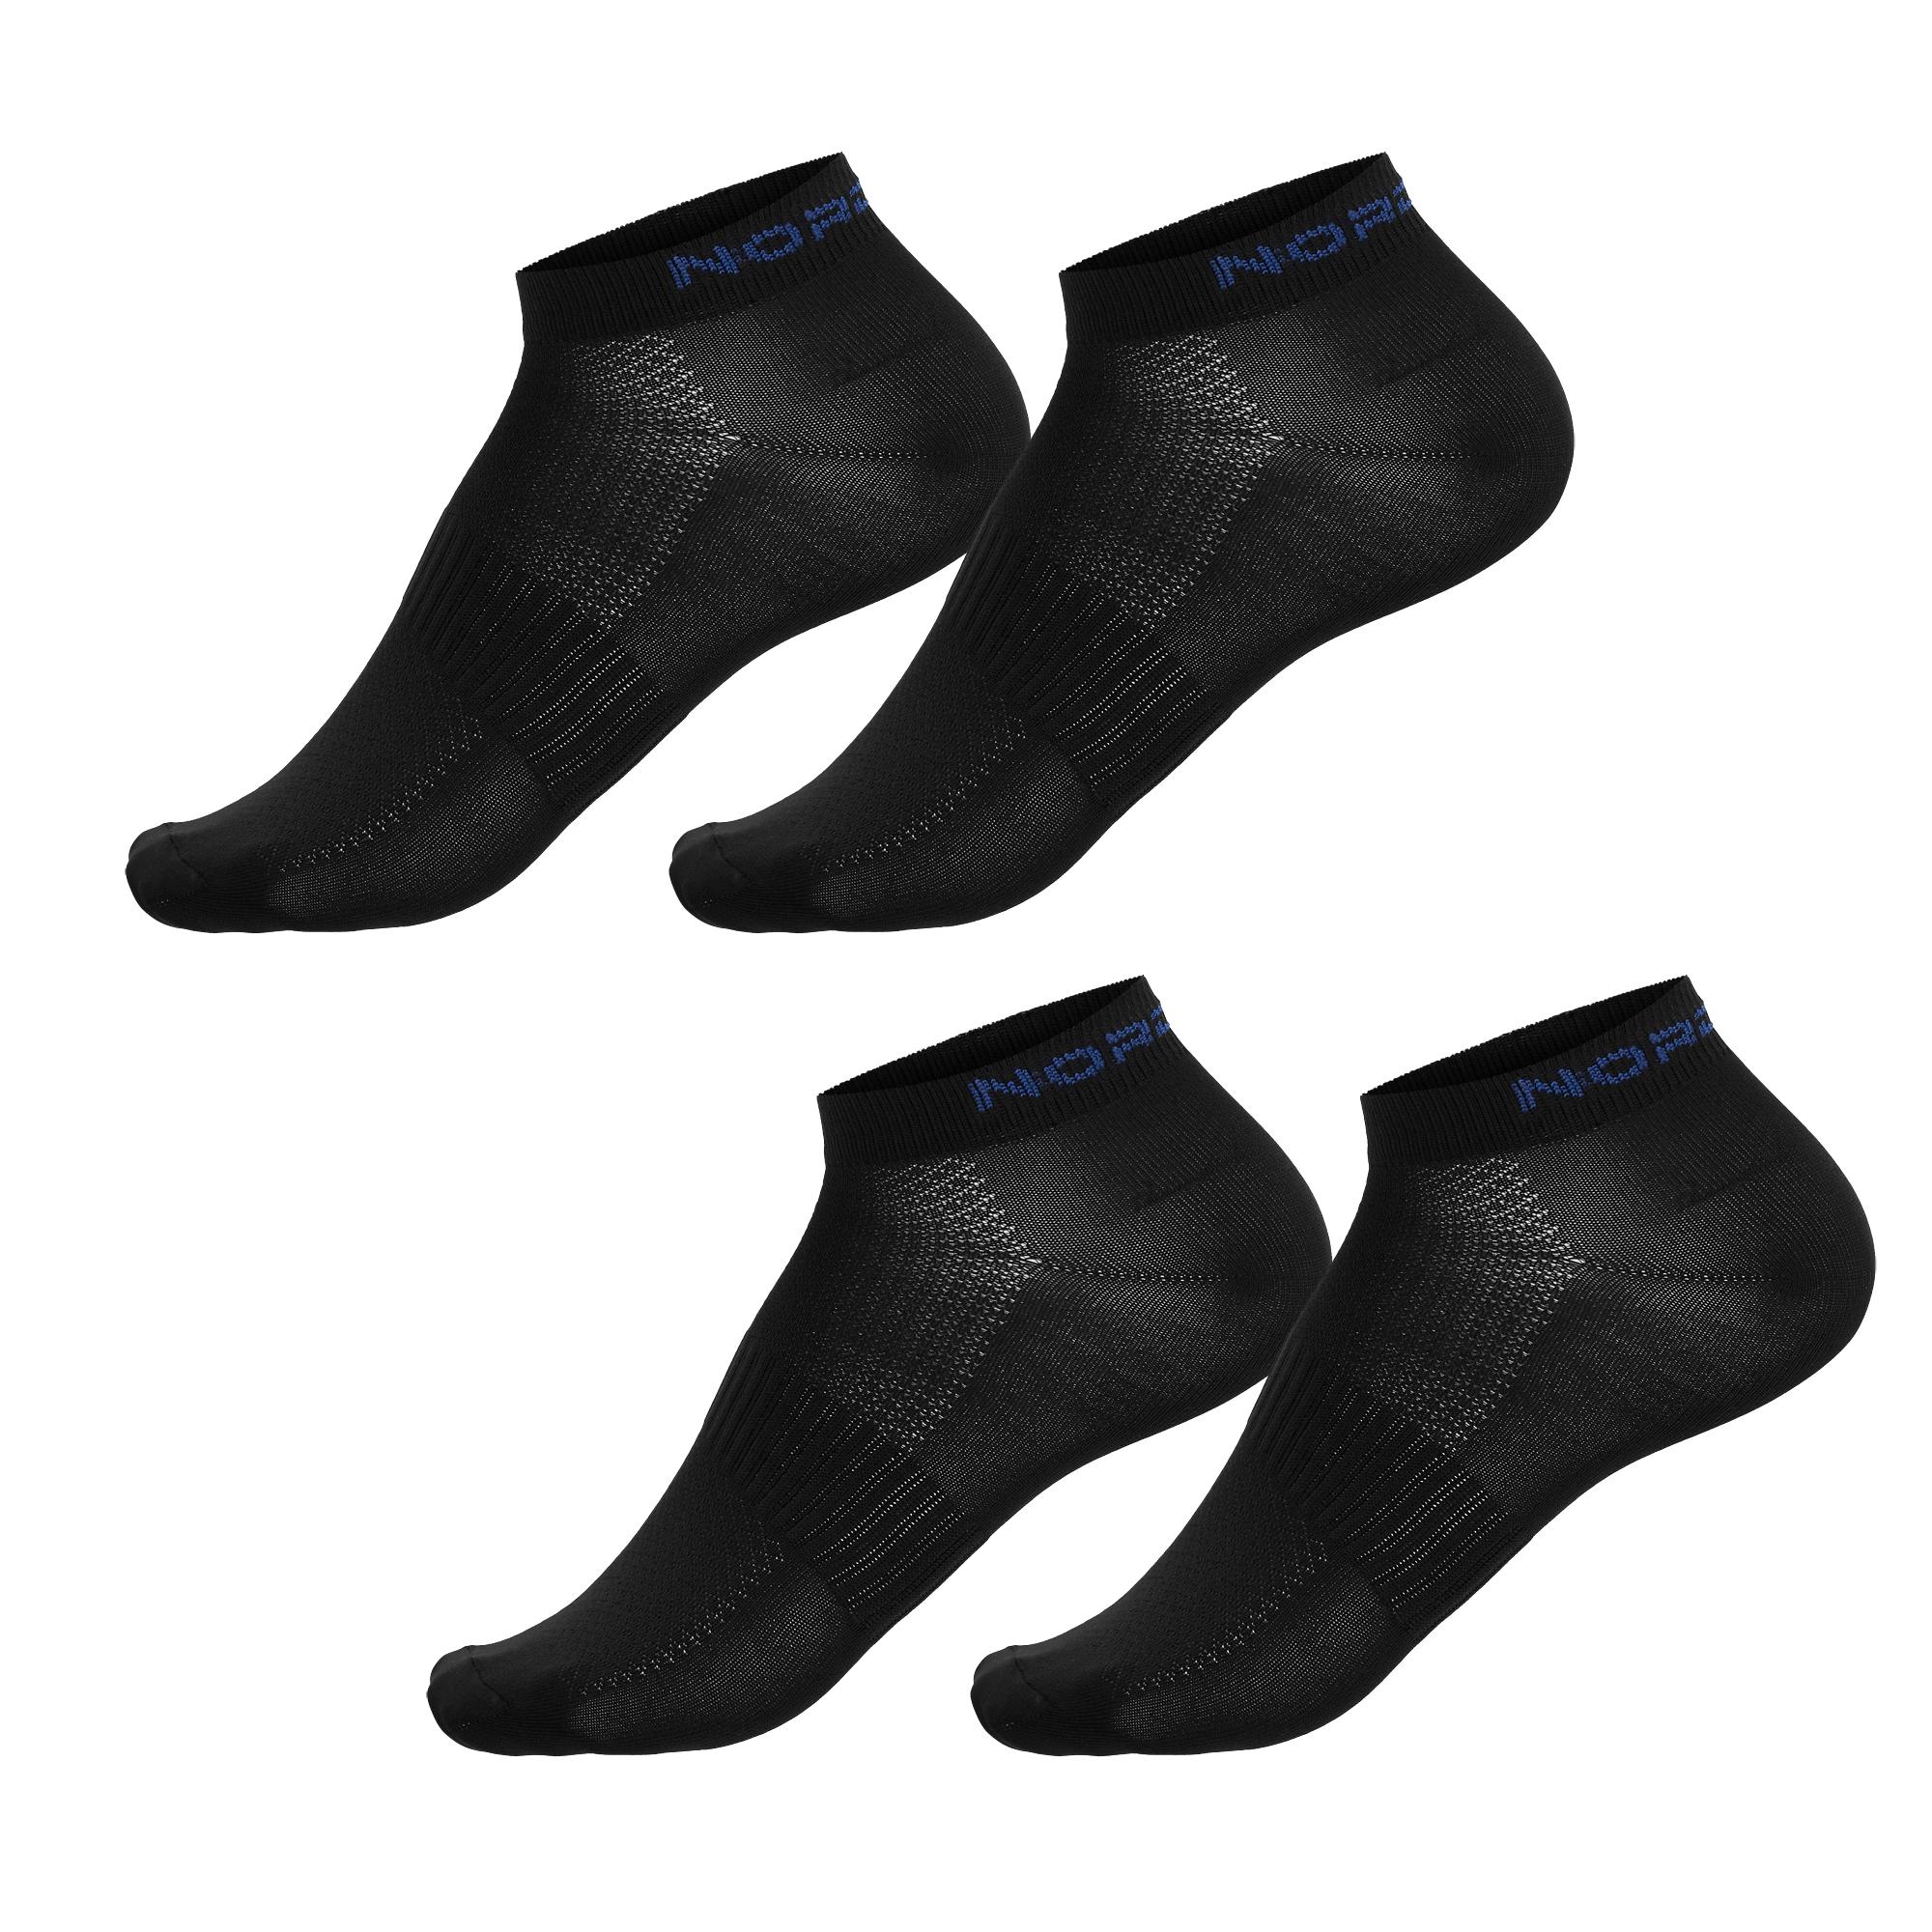 Nordski Run комплект спортивные носки black